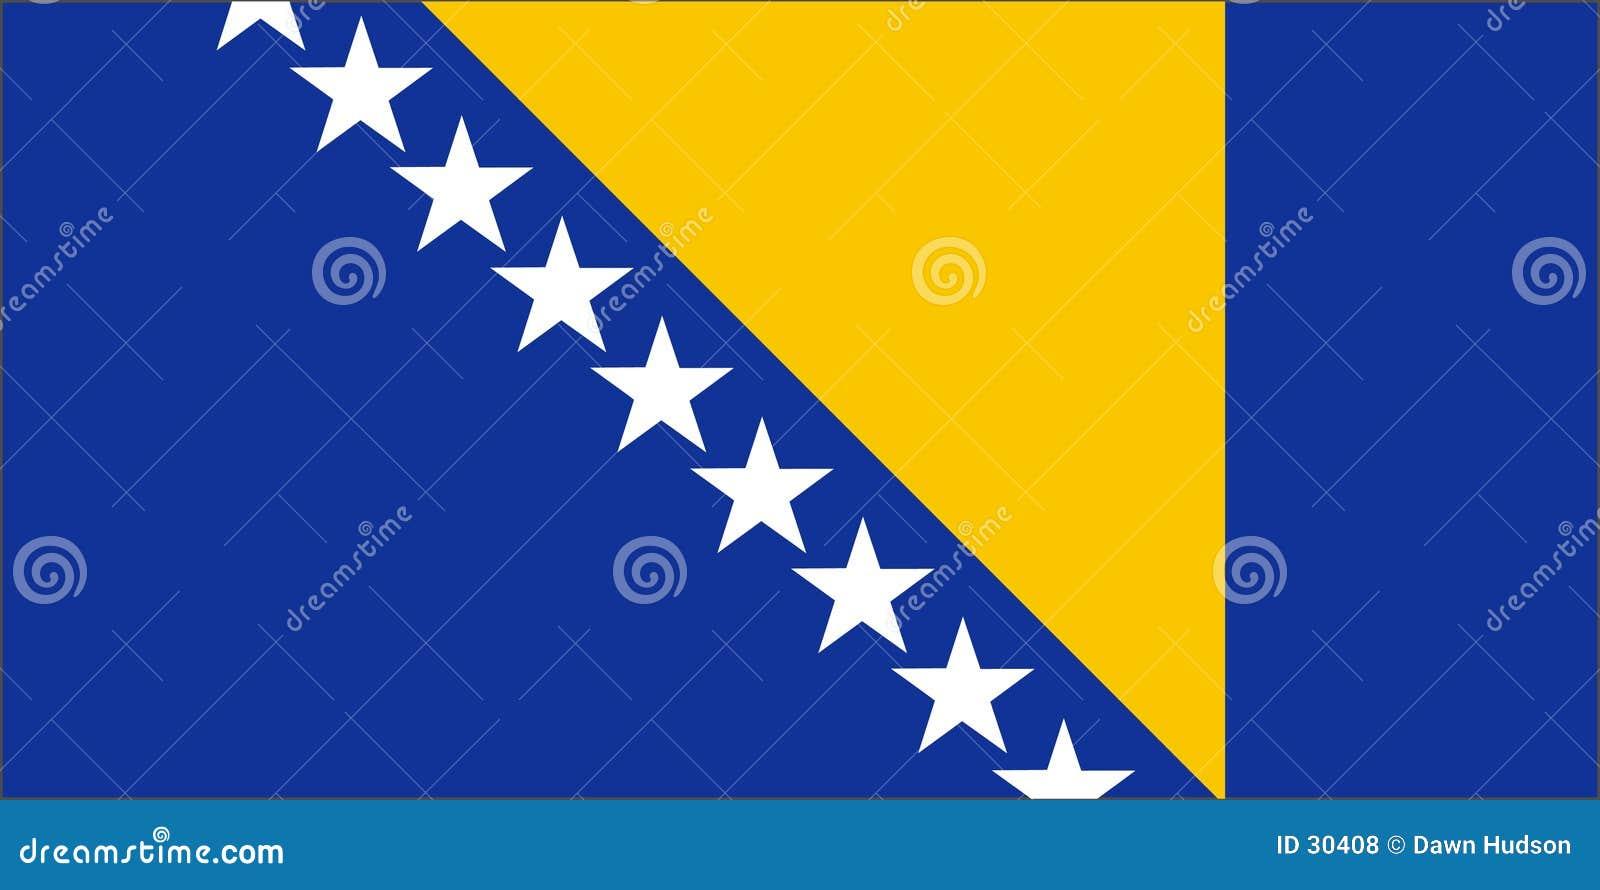 Босния - herzegovina